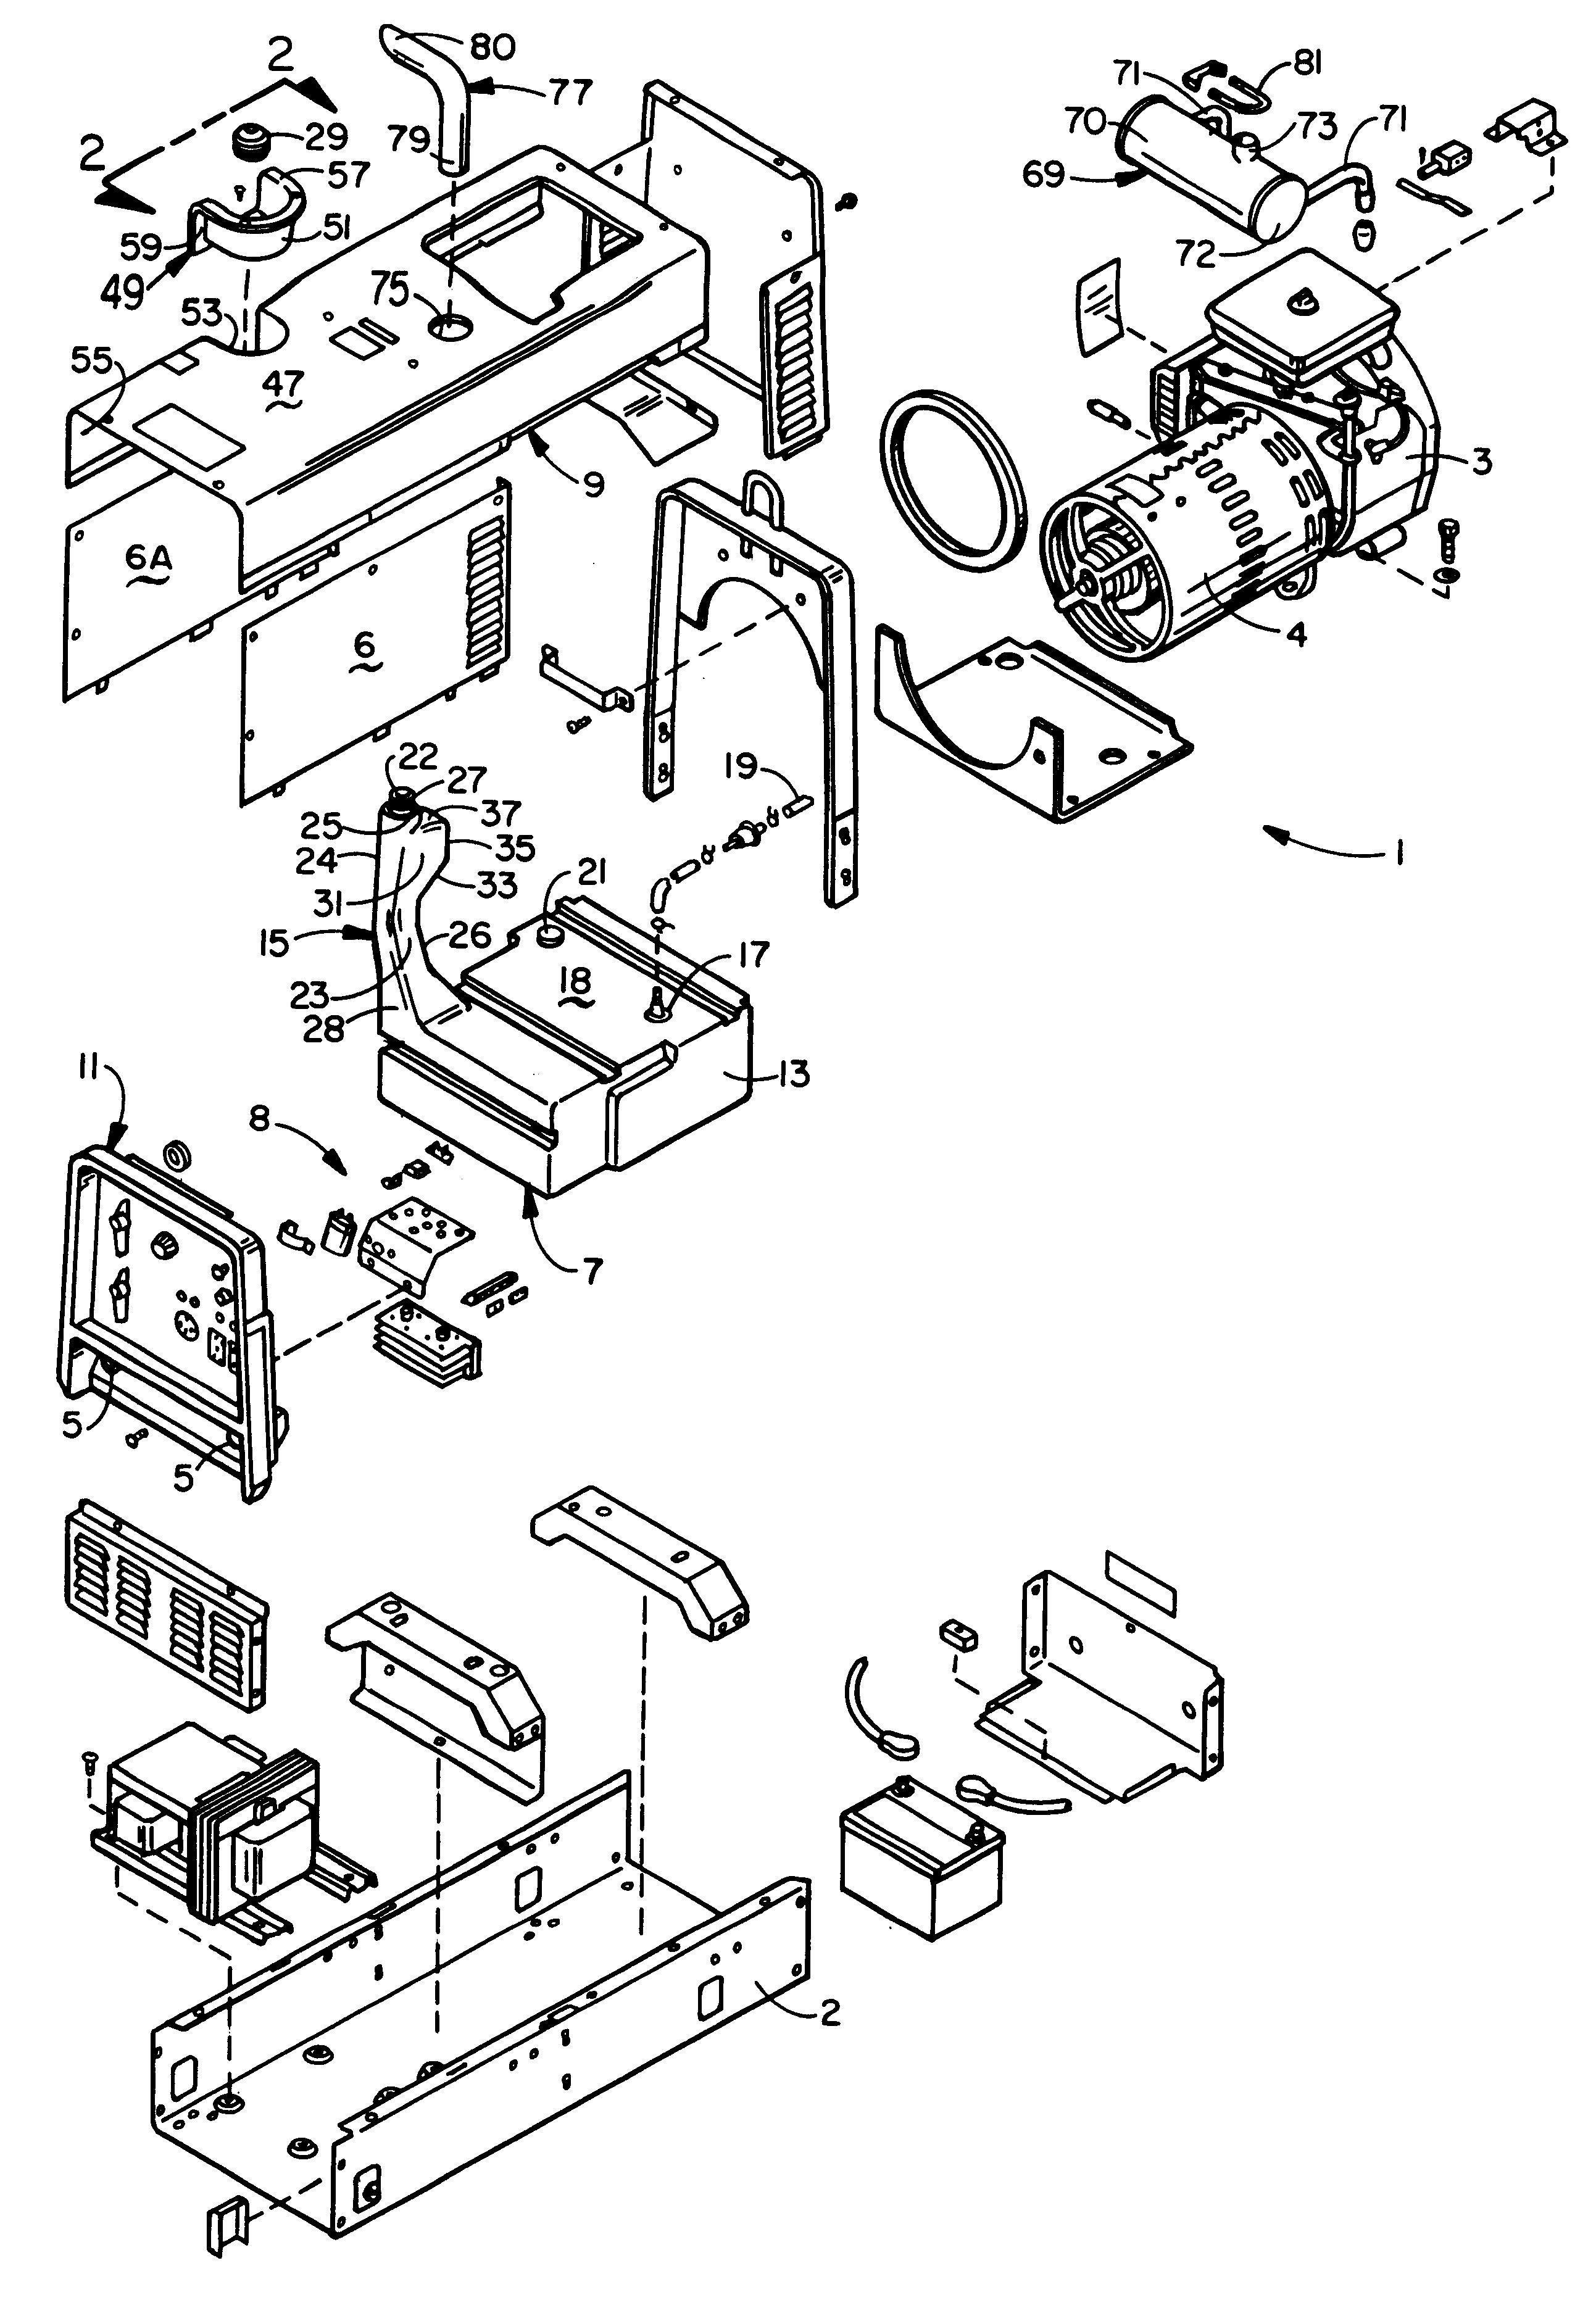 miller big 40 welder wiring diagram miller big 40 replacement parts miller big 40 for sale